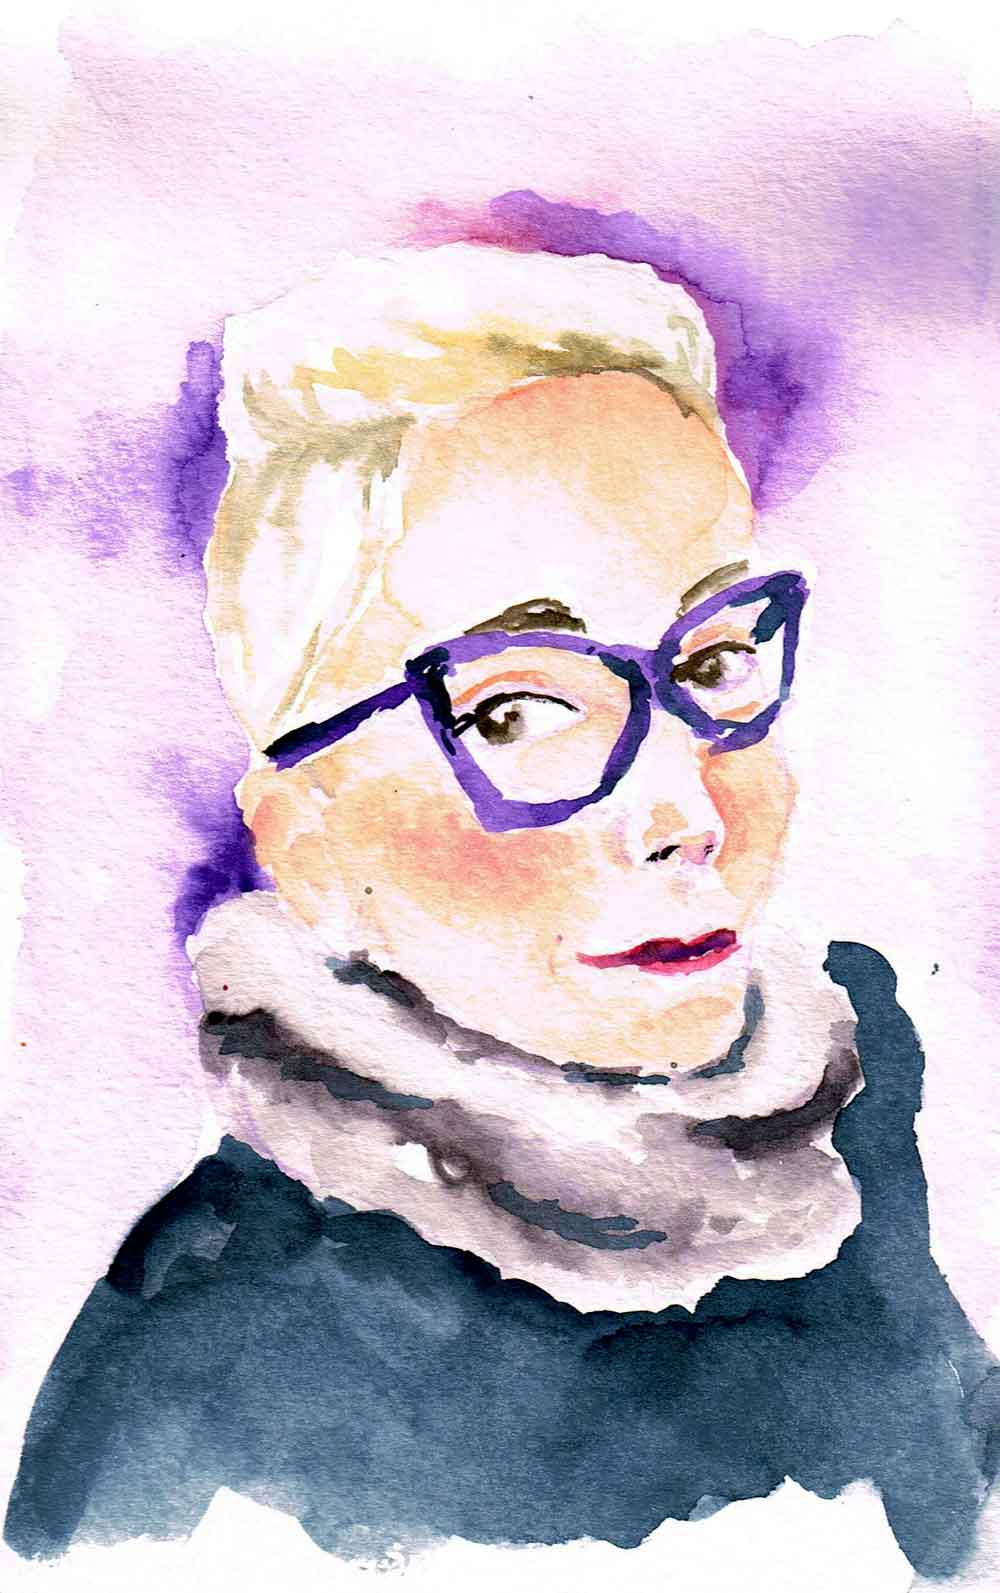 Watercolour-Portraits-1-Purple-Frames-kw.jpg